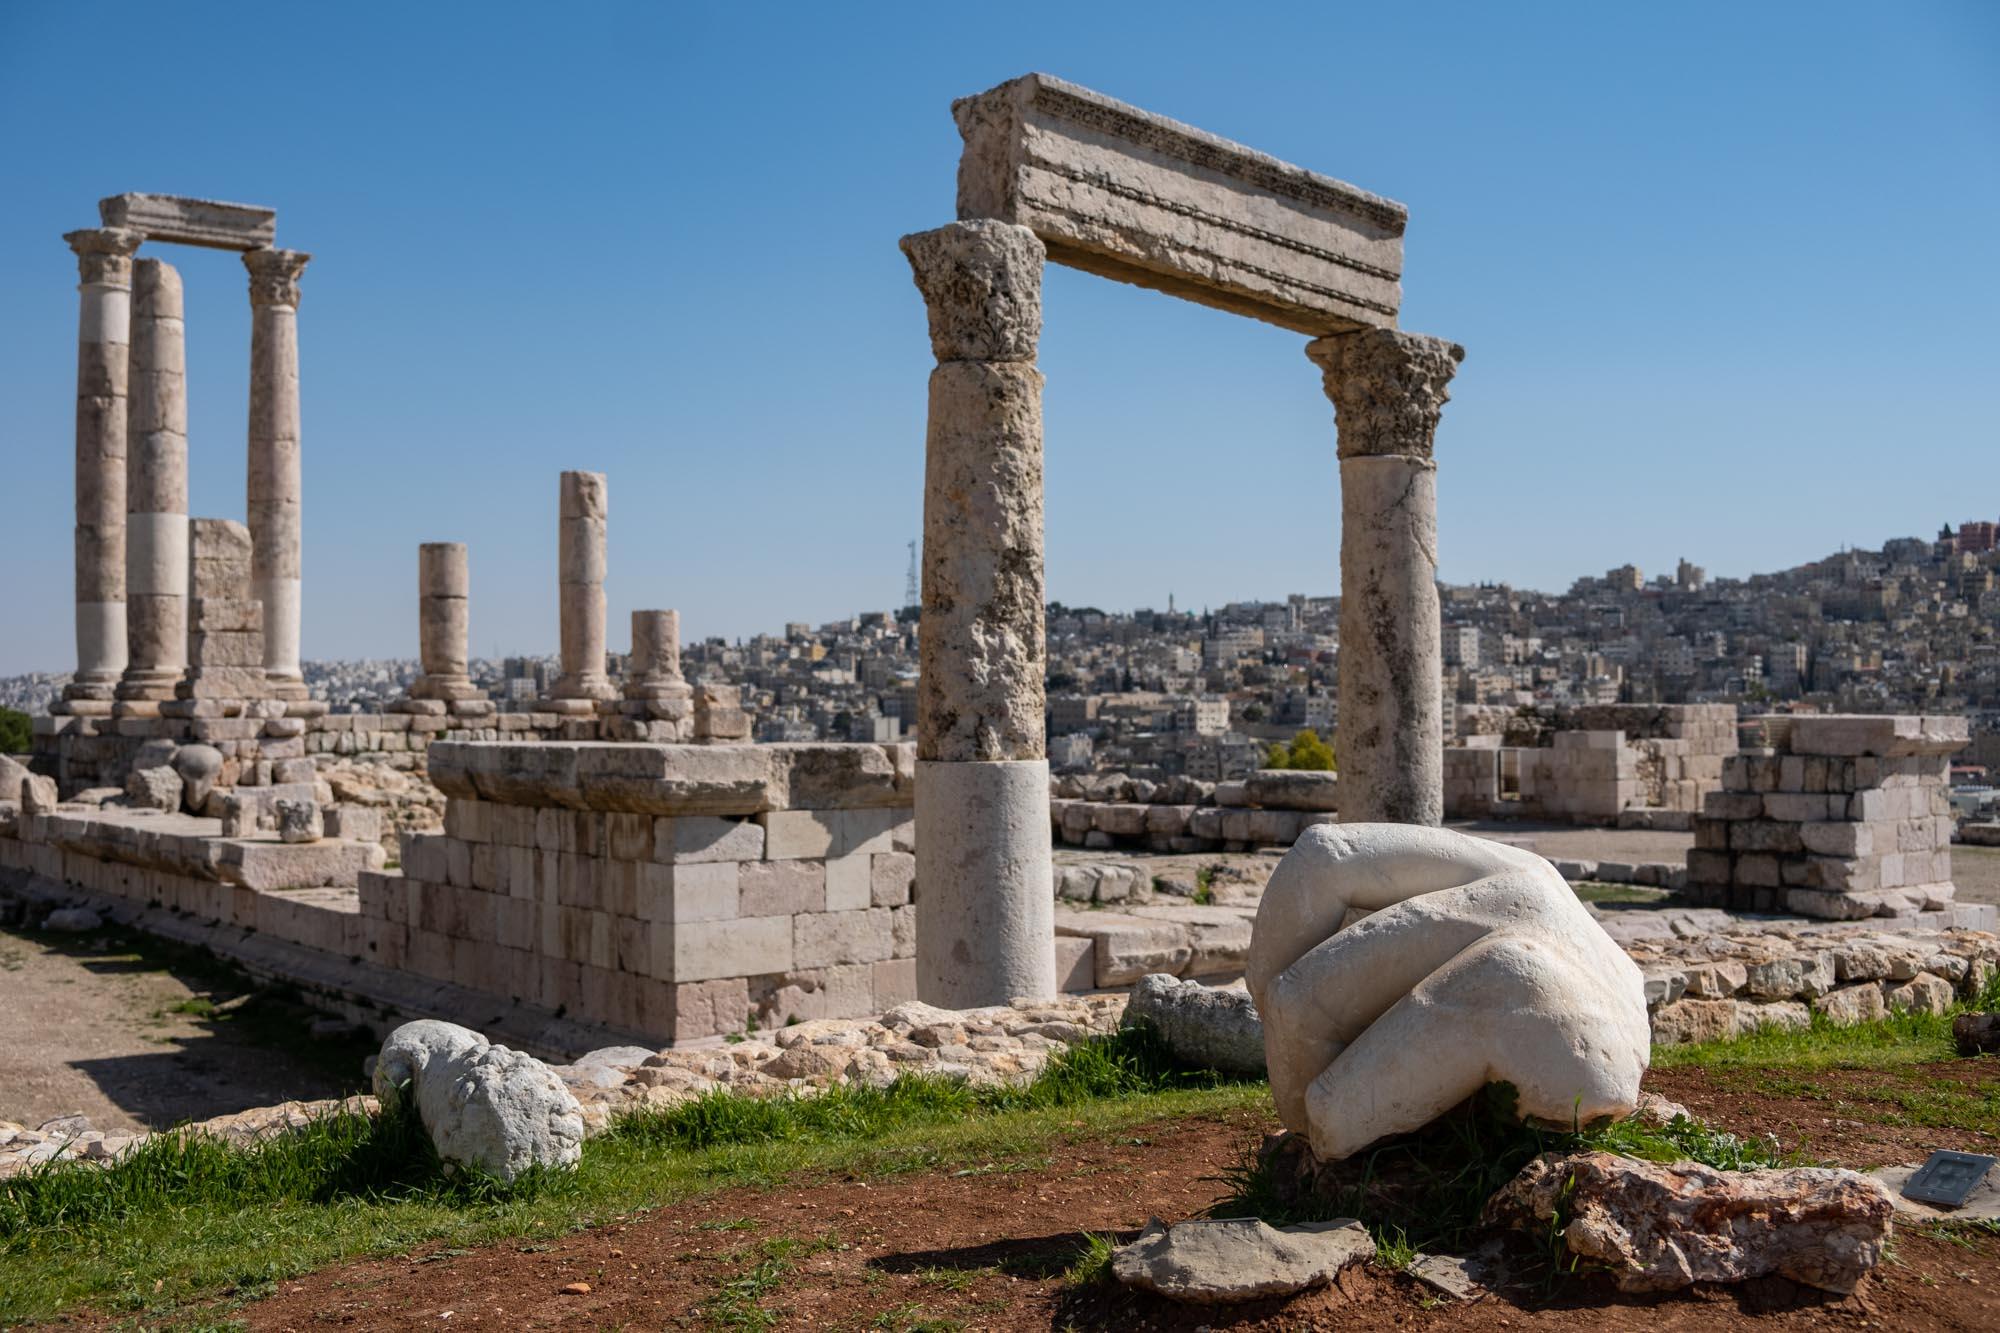 Jordan itinerary for 7-10 days